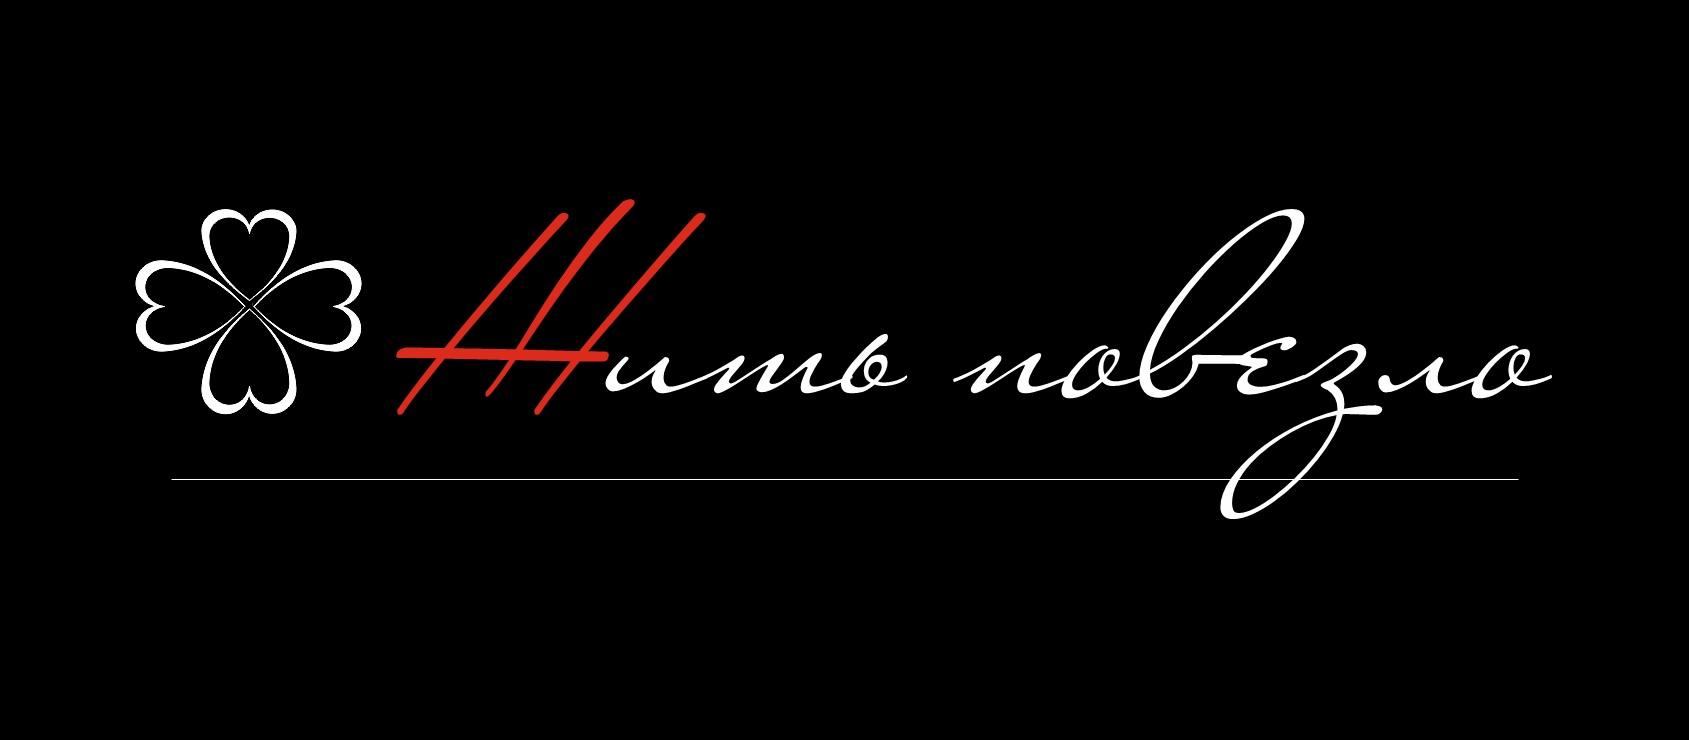 Логотип и фирменный стиль фото f_4805bc2eb20cb81f.jpg